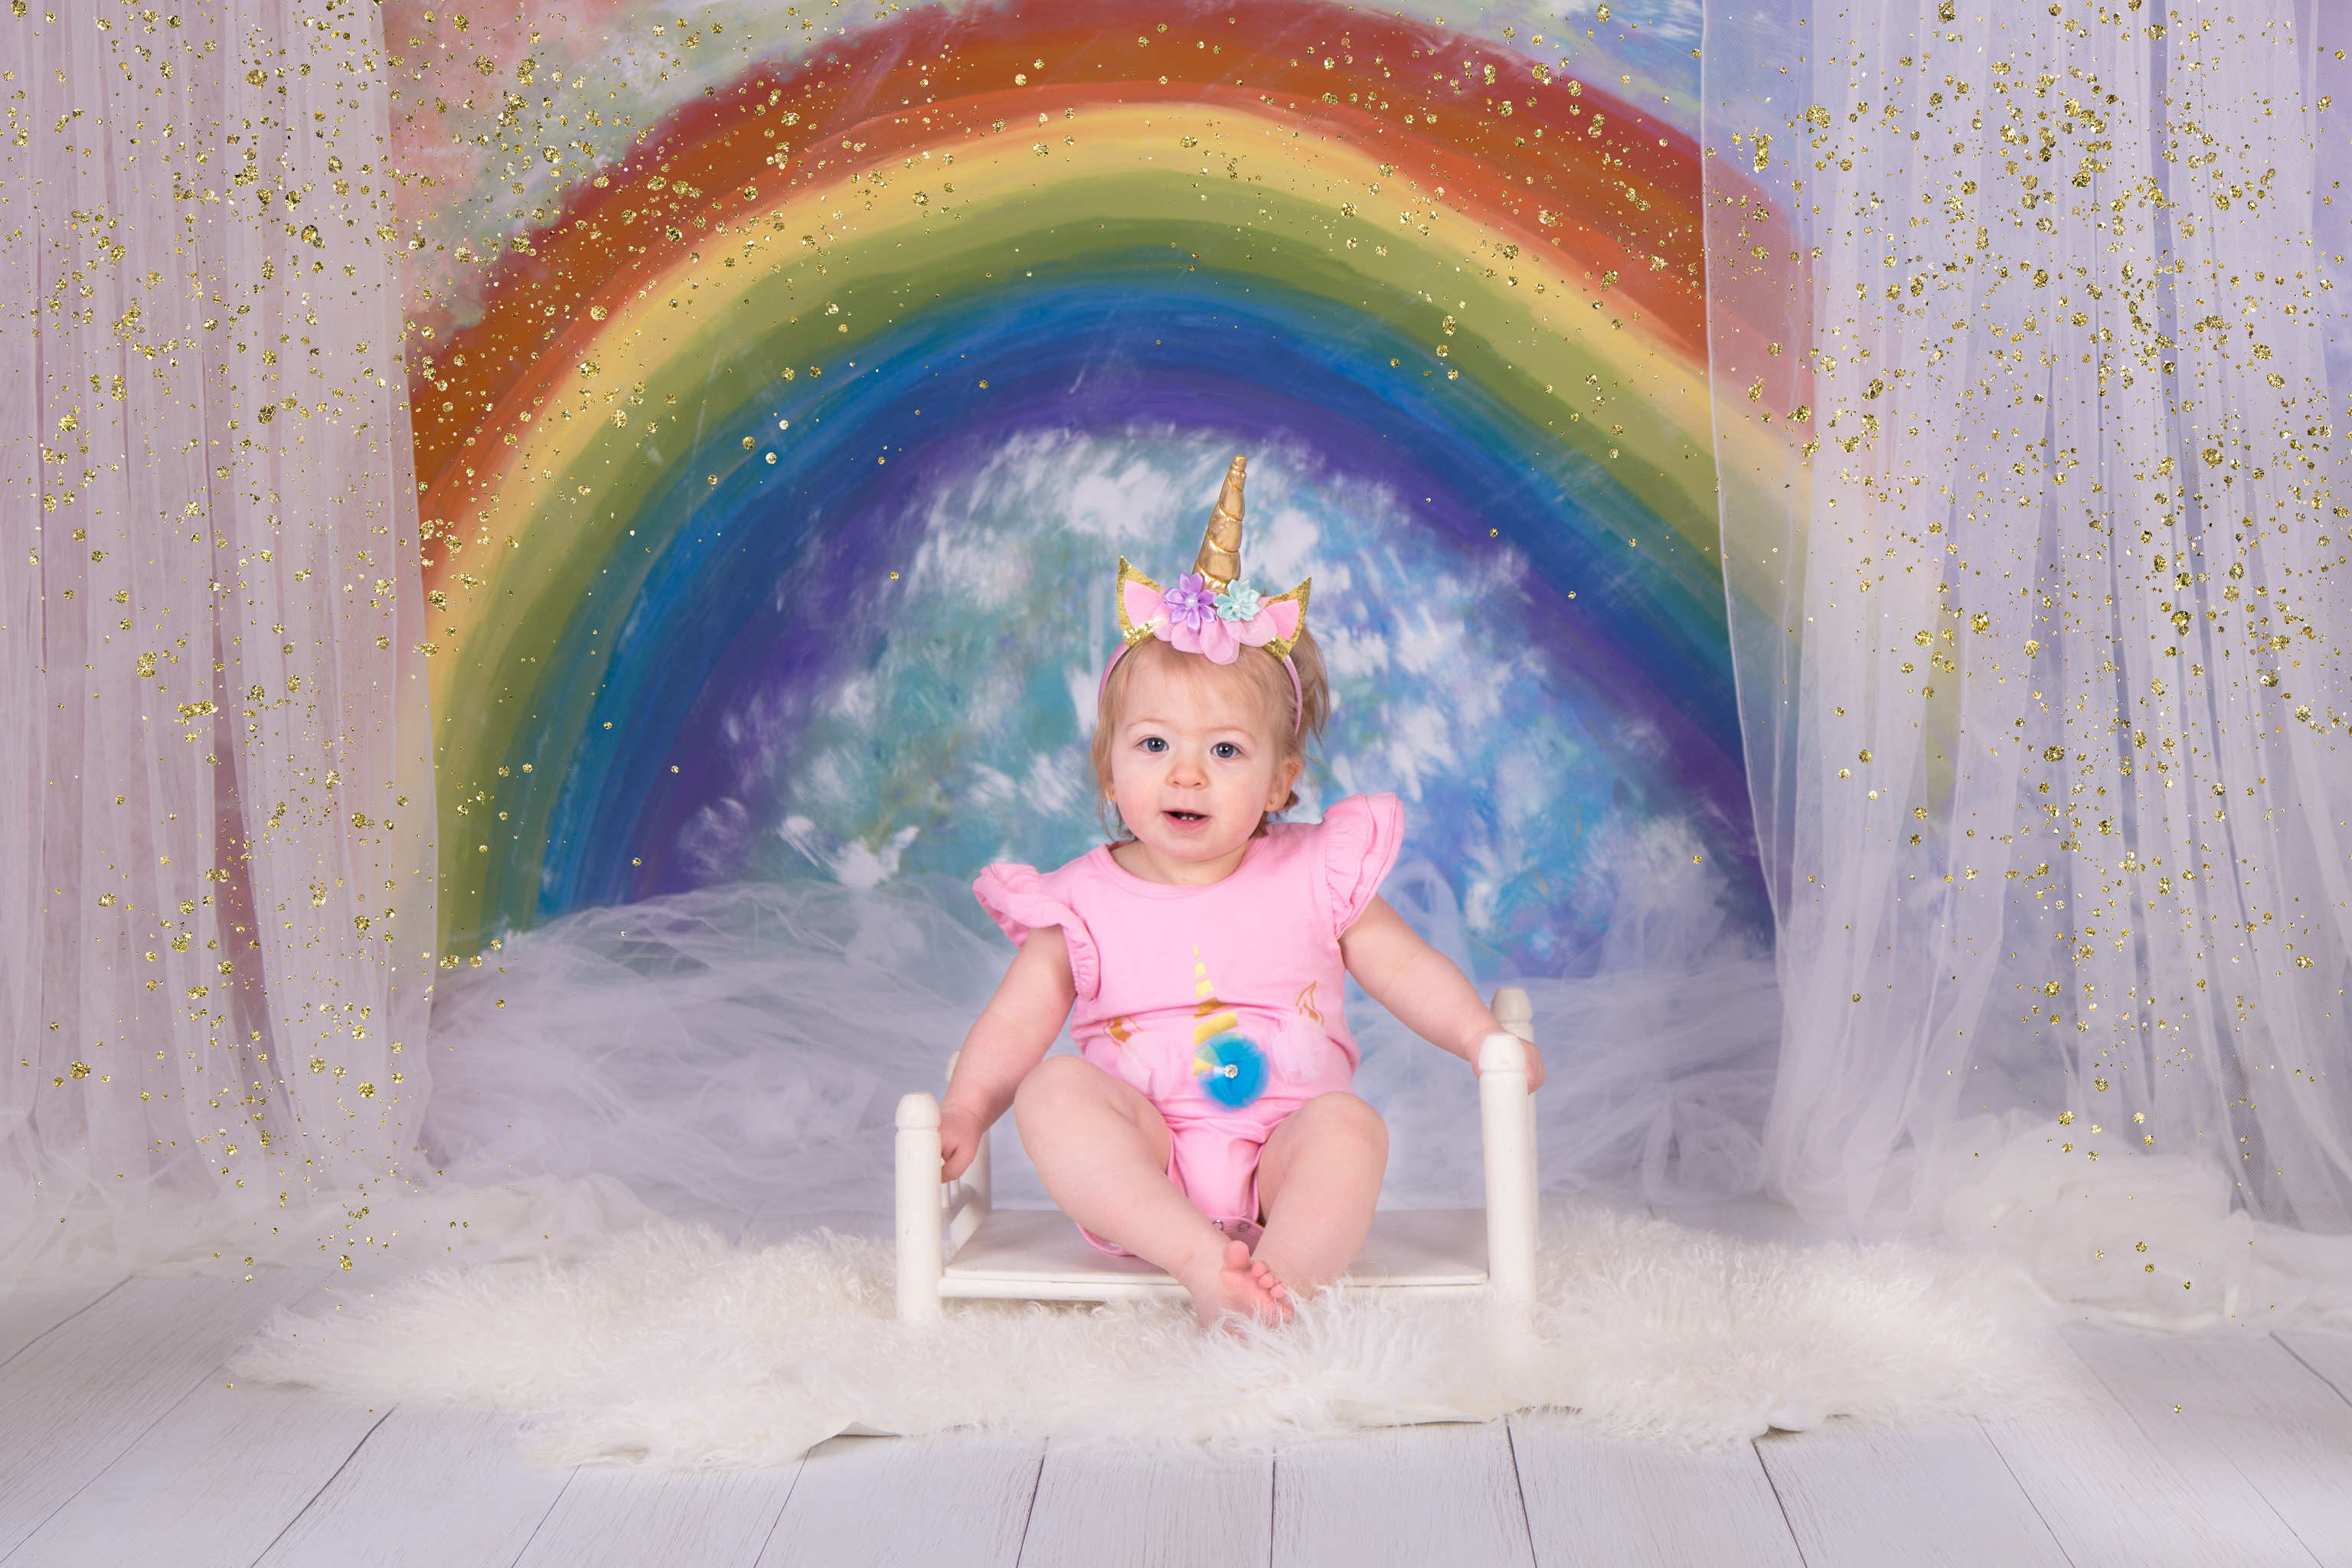 Girl wearing unicorn headband posing in front of rainbow background